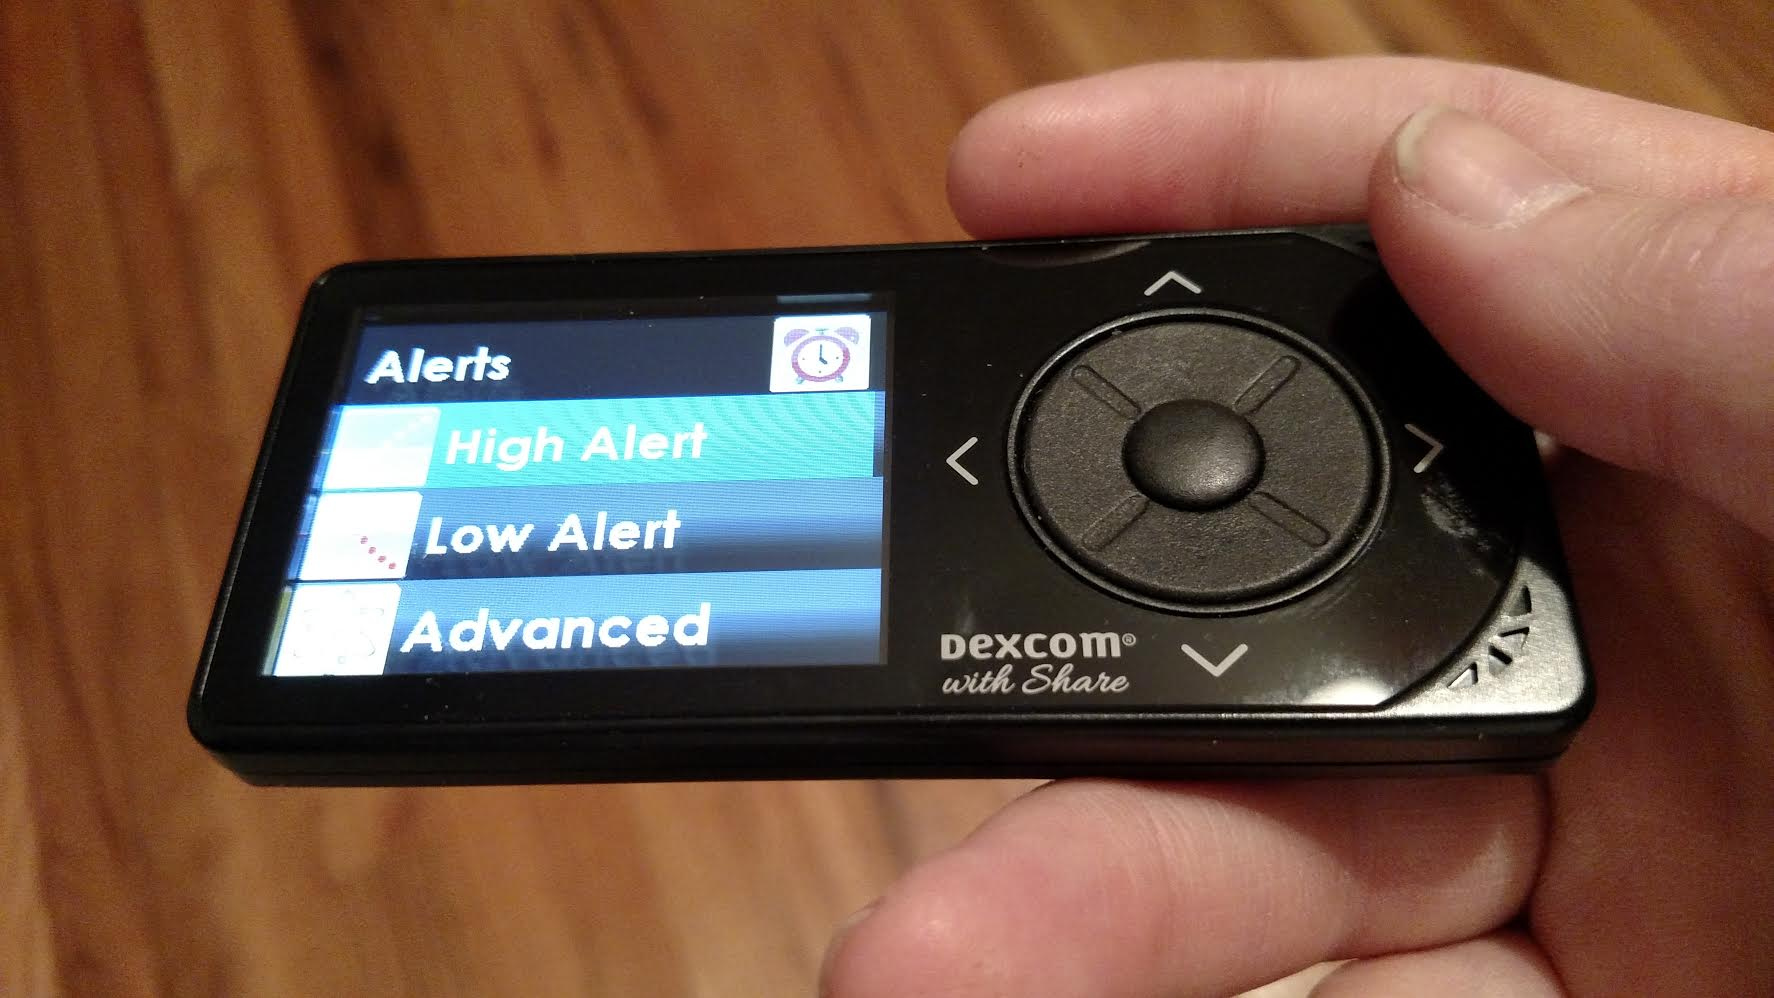 Dexcom Alerts